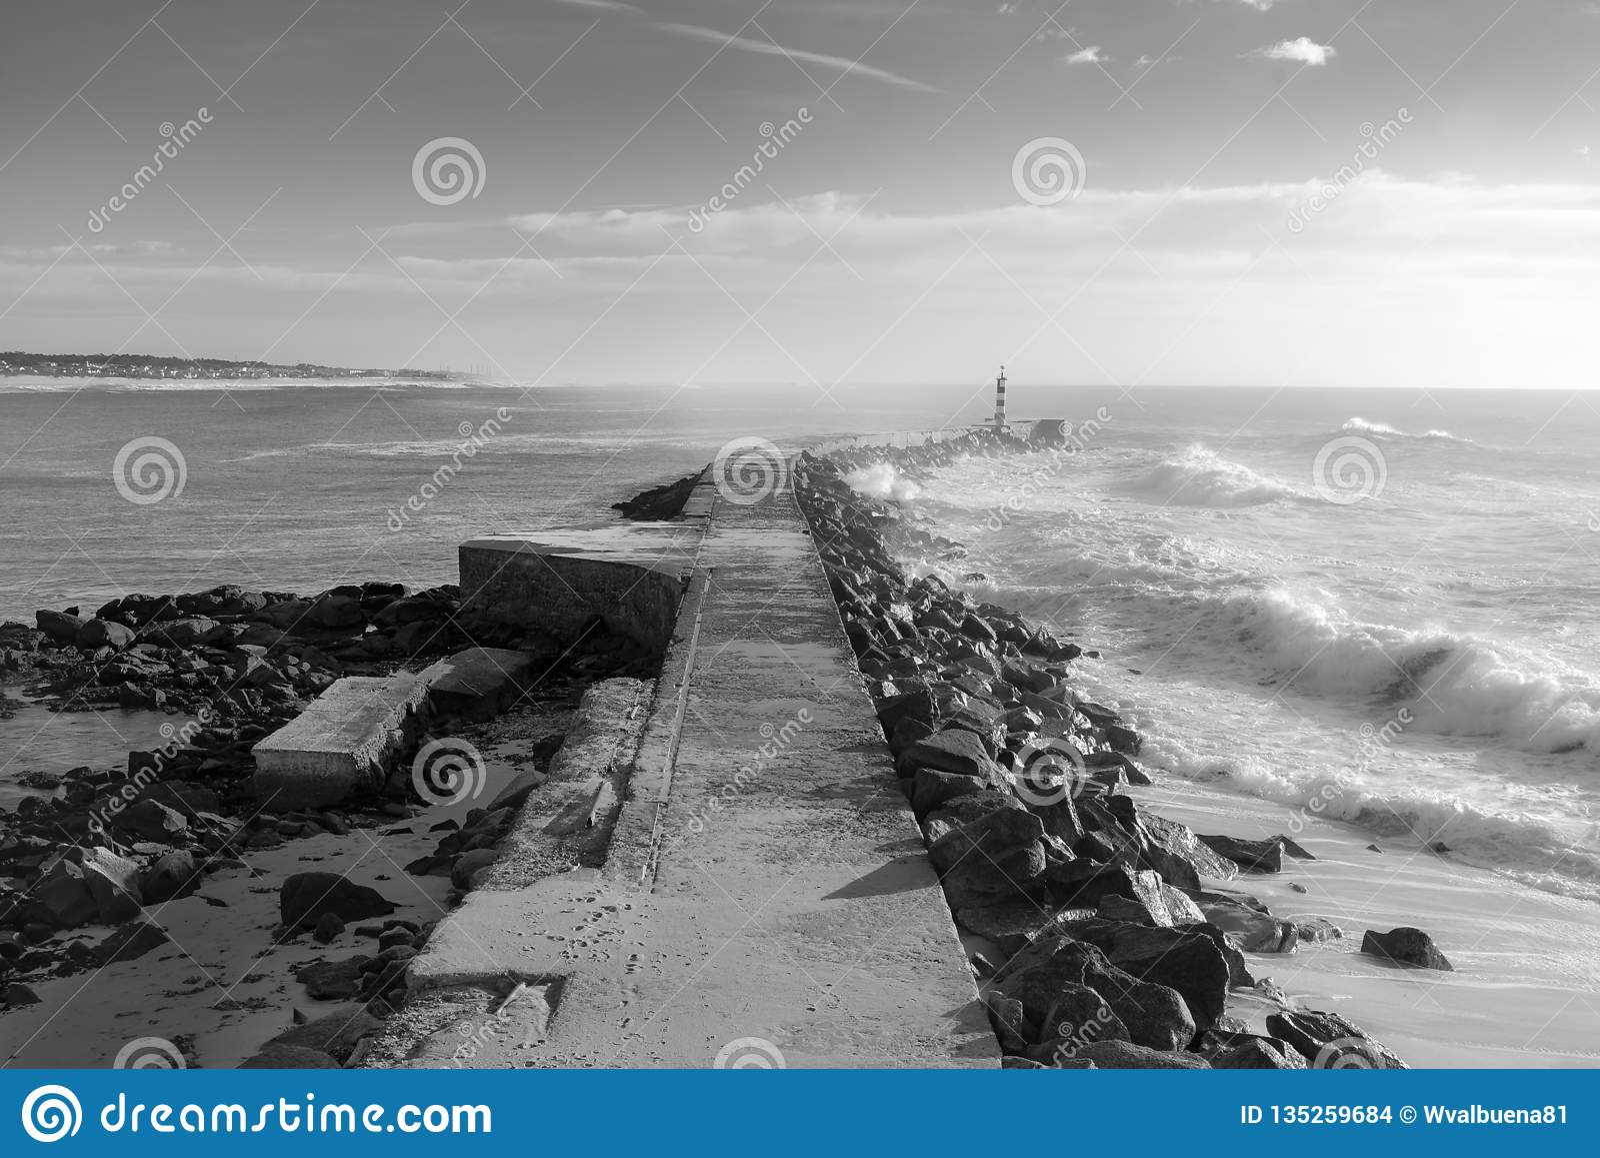 Lighthouse of vila do conde seascape photography stock photo image